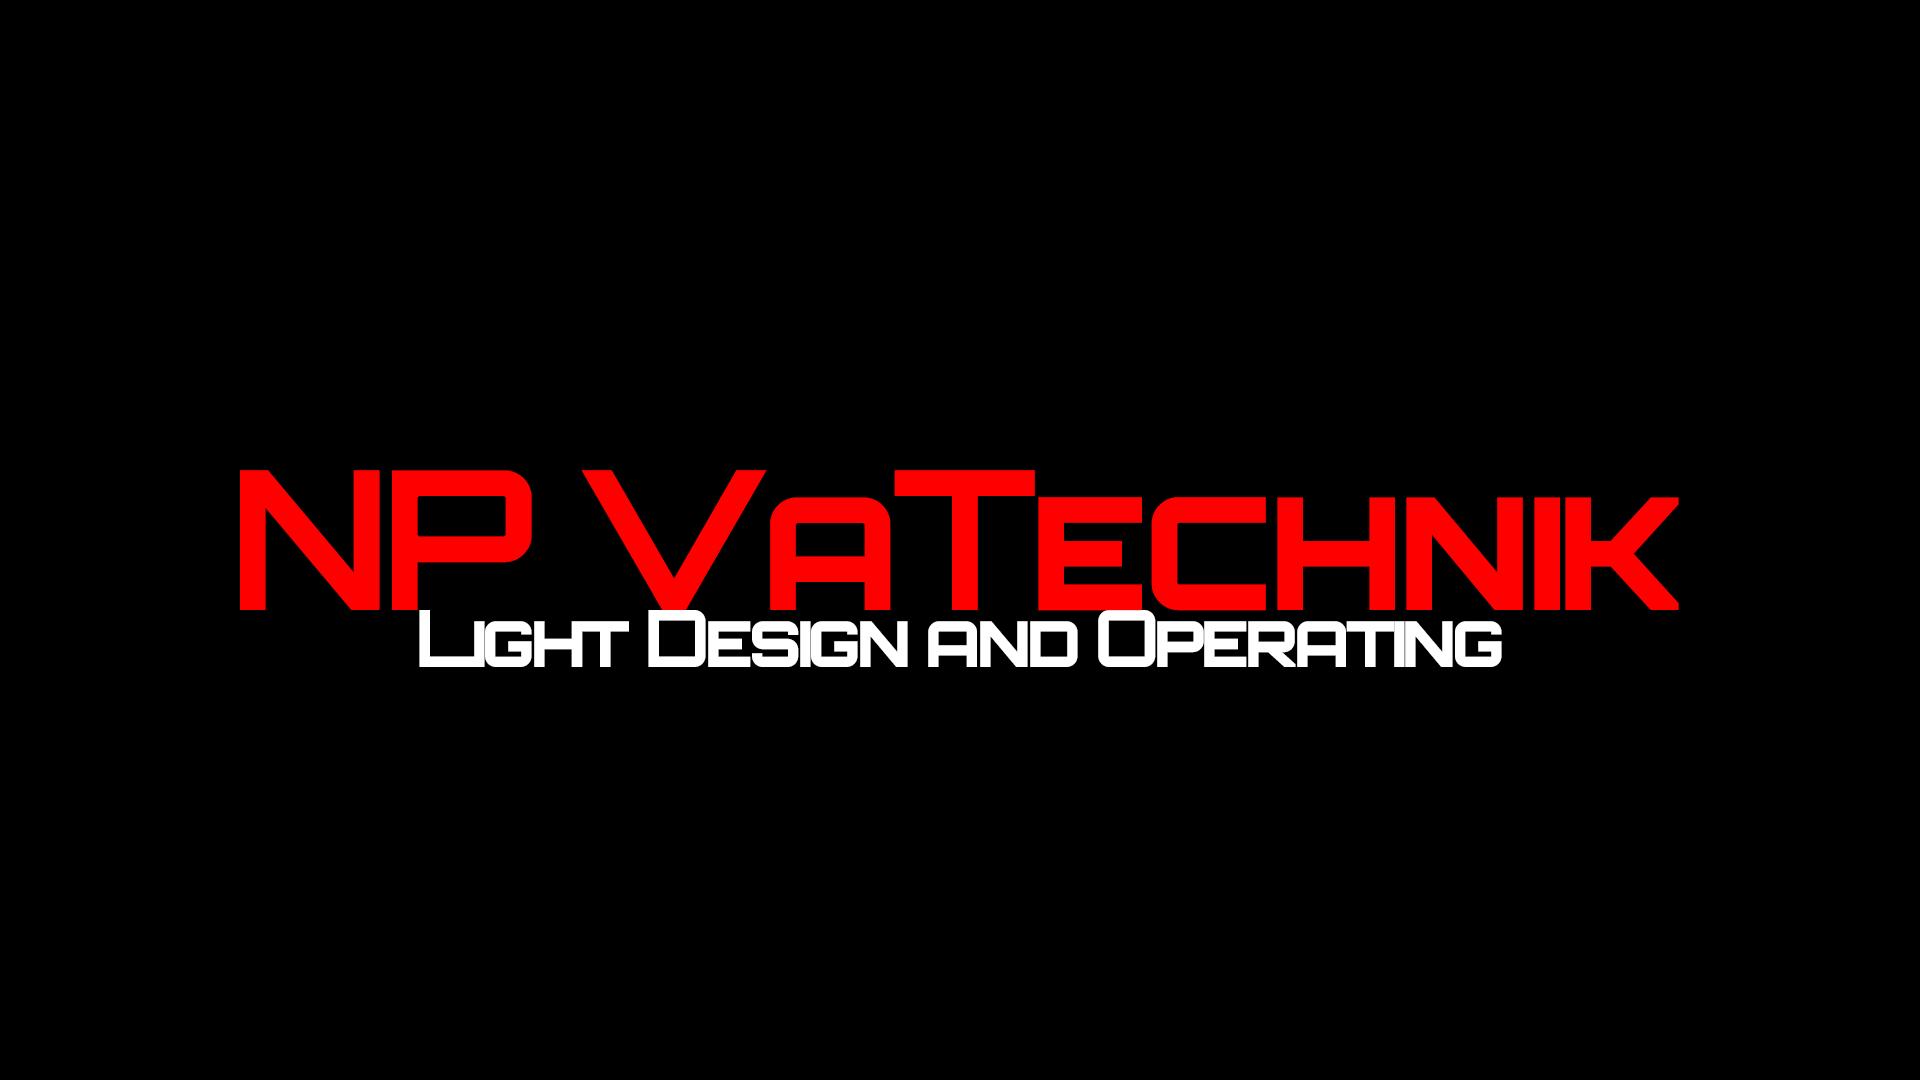 Logo der NP VaTechnik